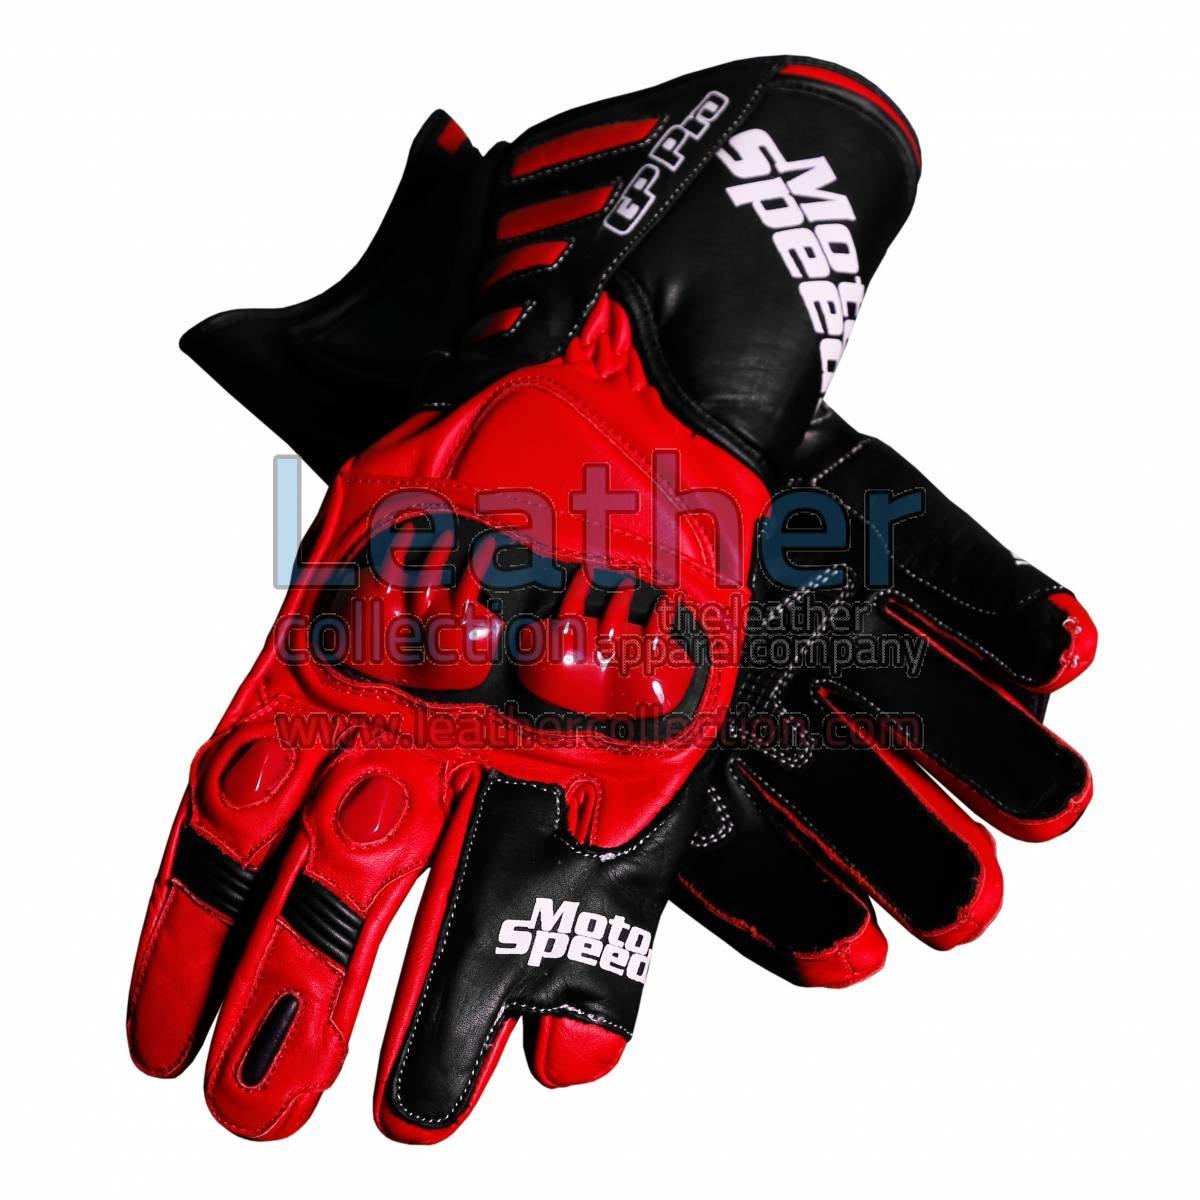 Marc Marquez 2015 - 2016 Motorbike Racing Gloves